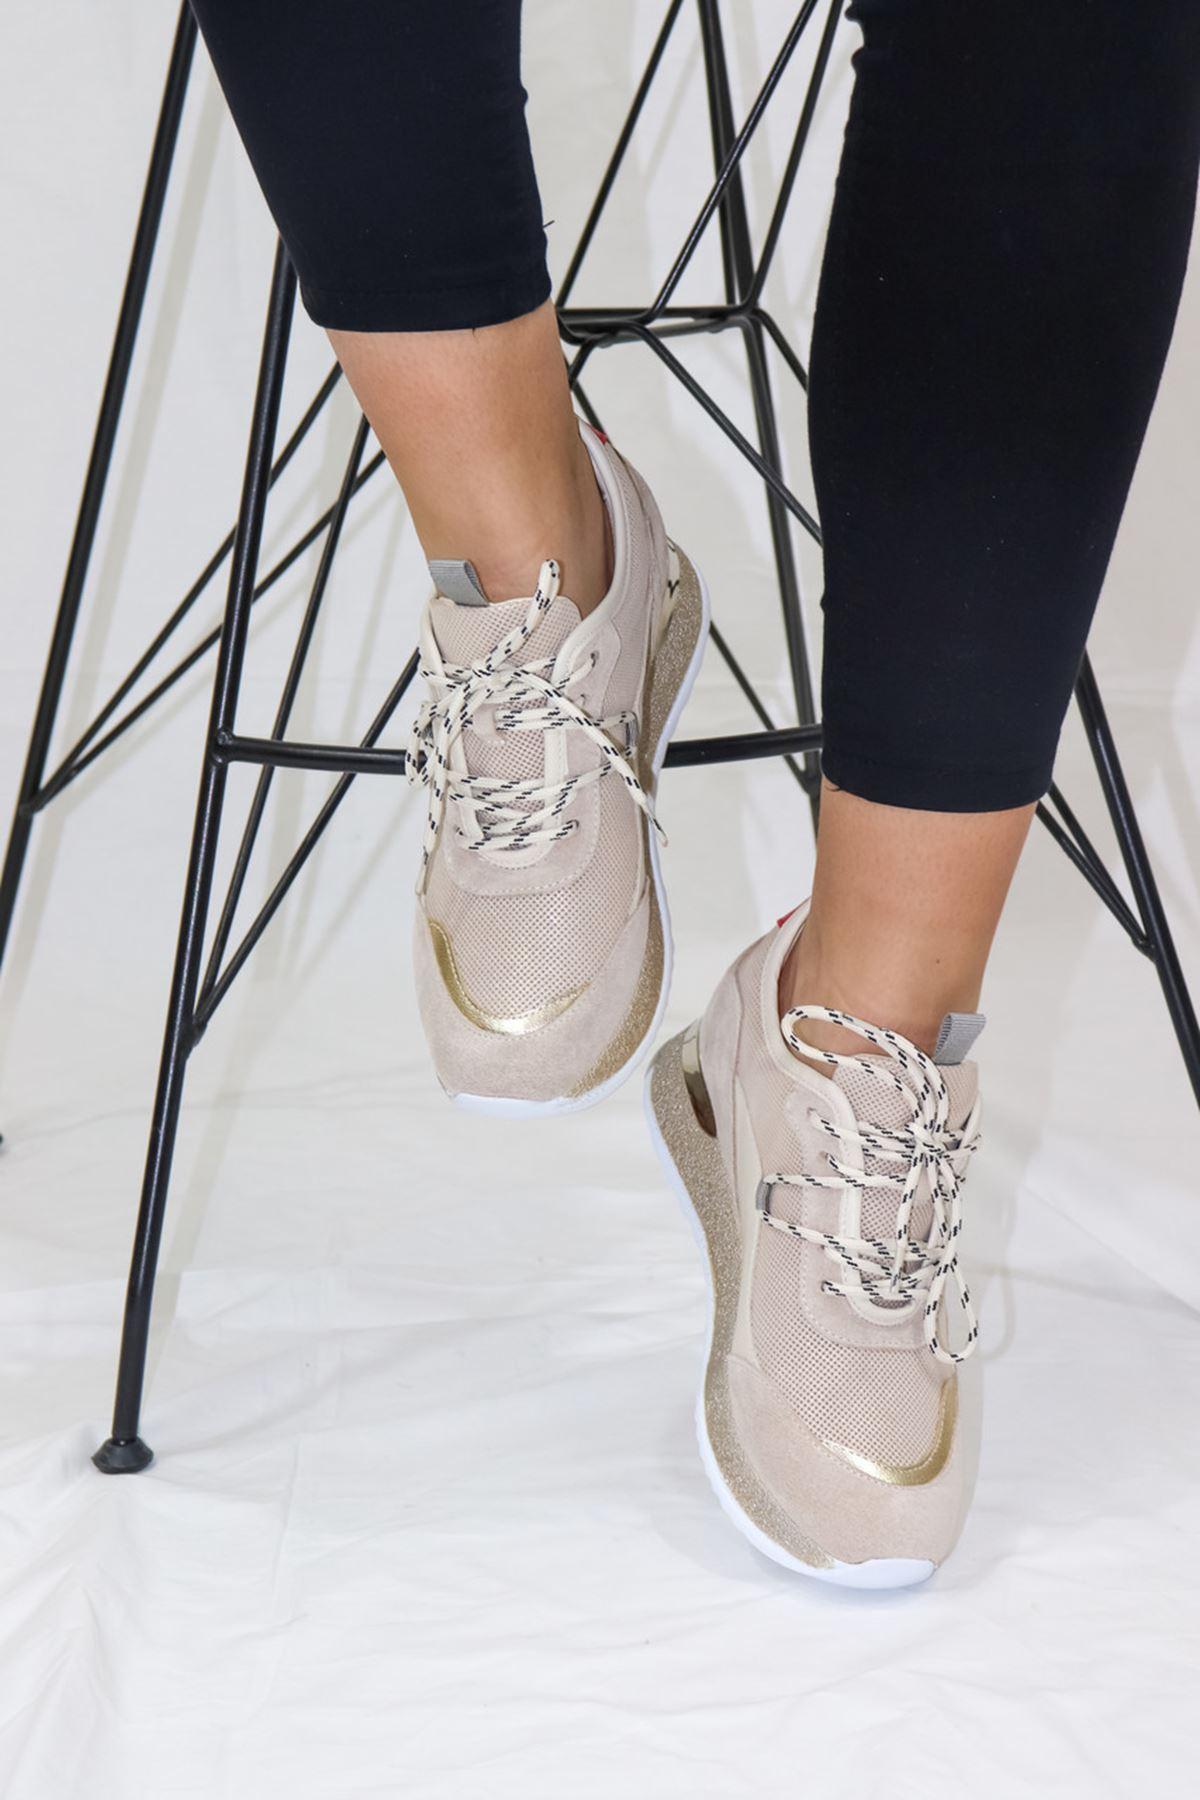 Mammamia - D21YA -570-Z Bej Spor Ayakkabı